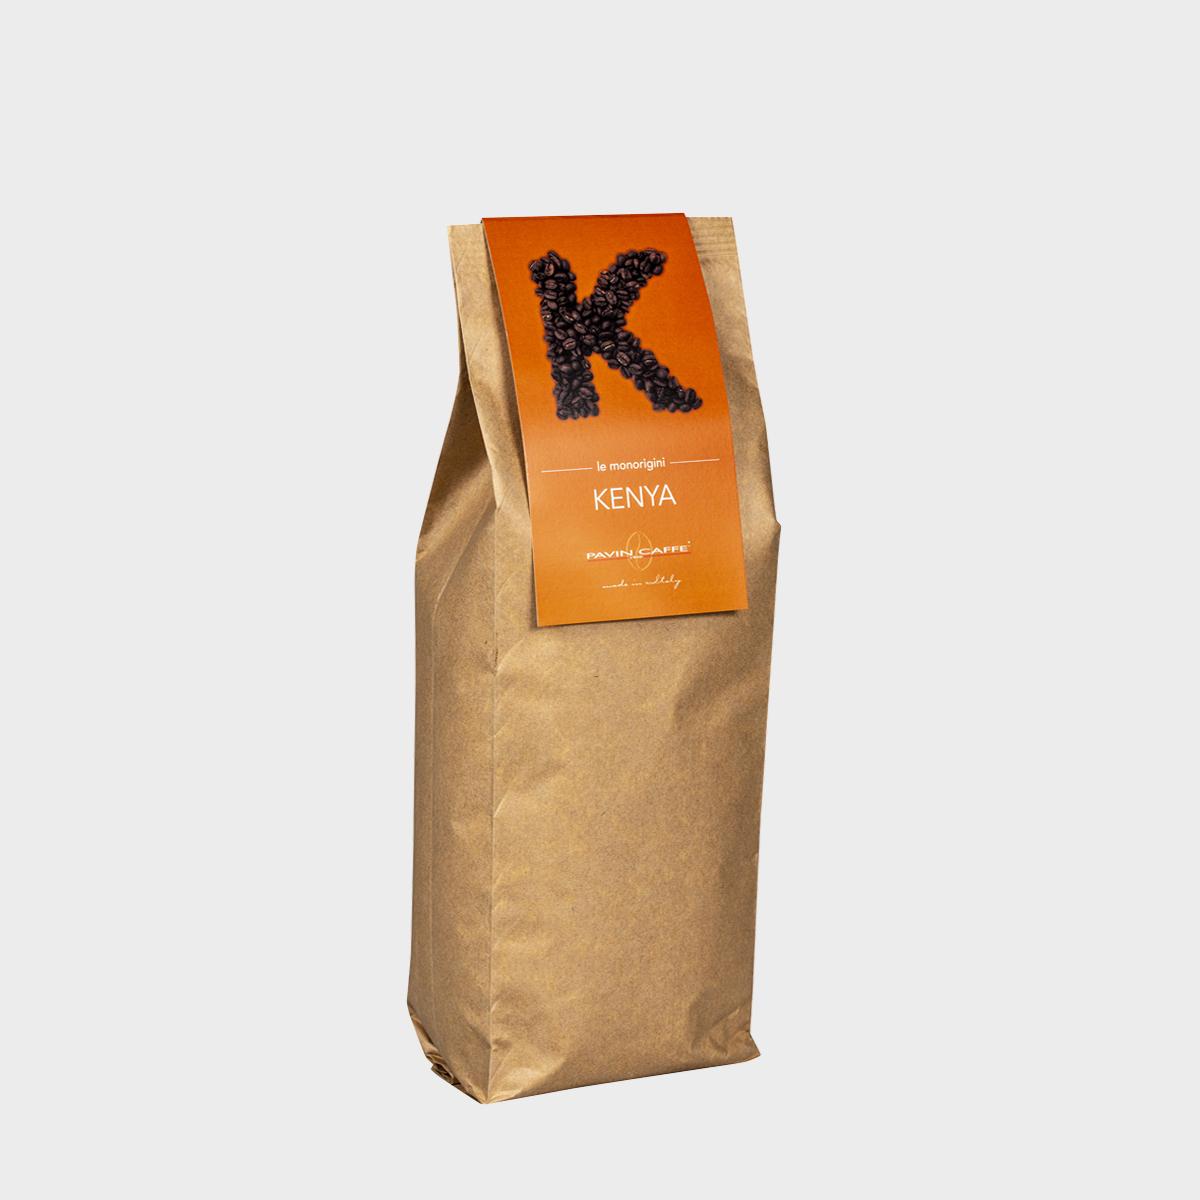 monorigine-pavin-caffe-kenya